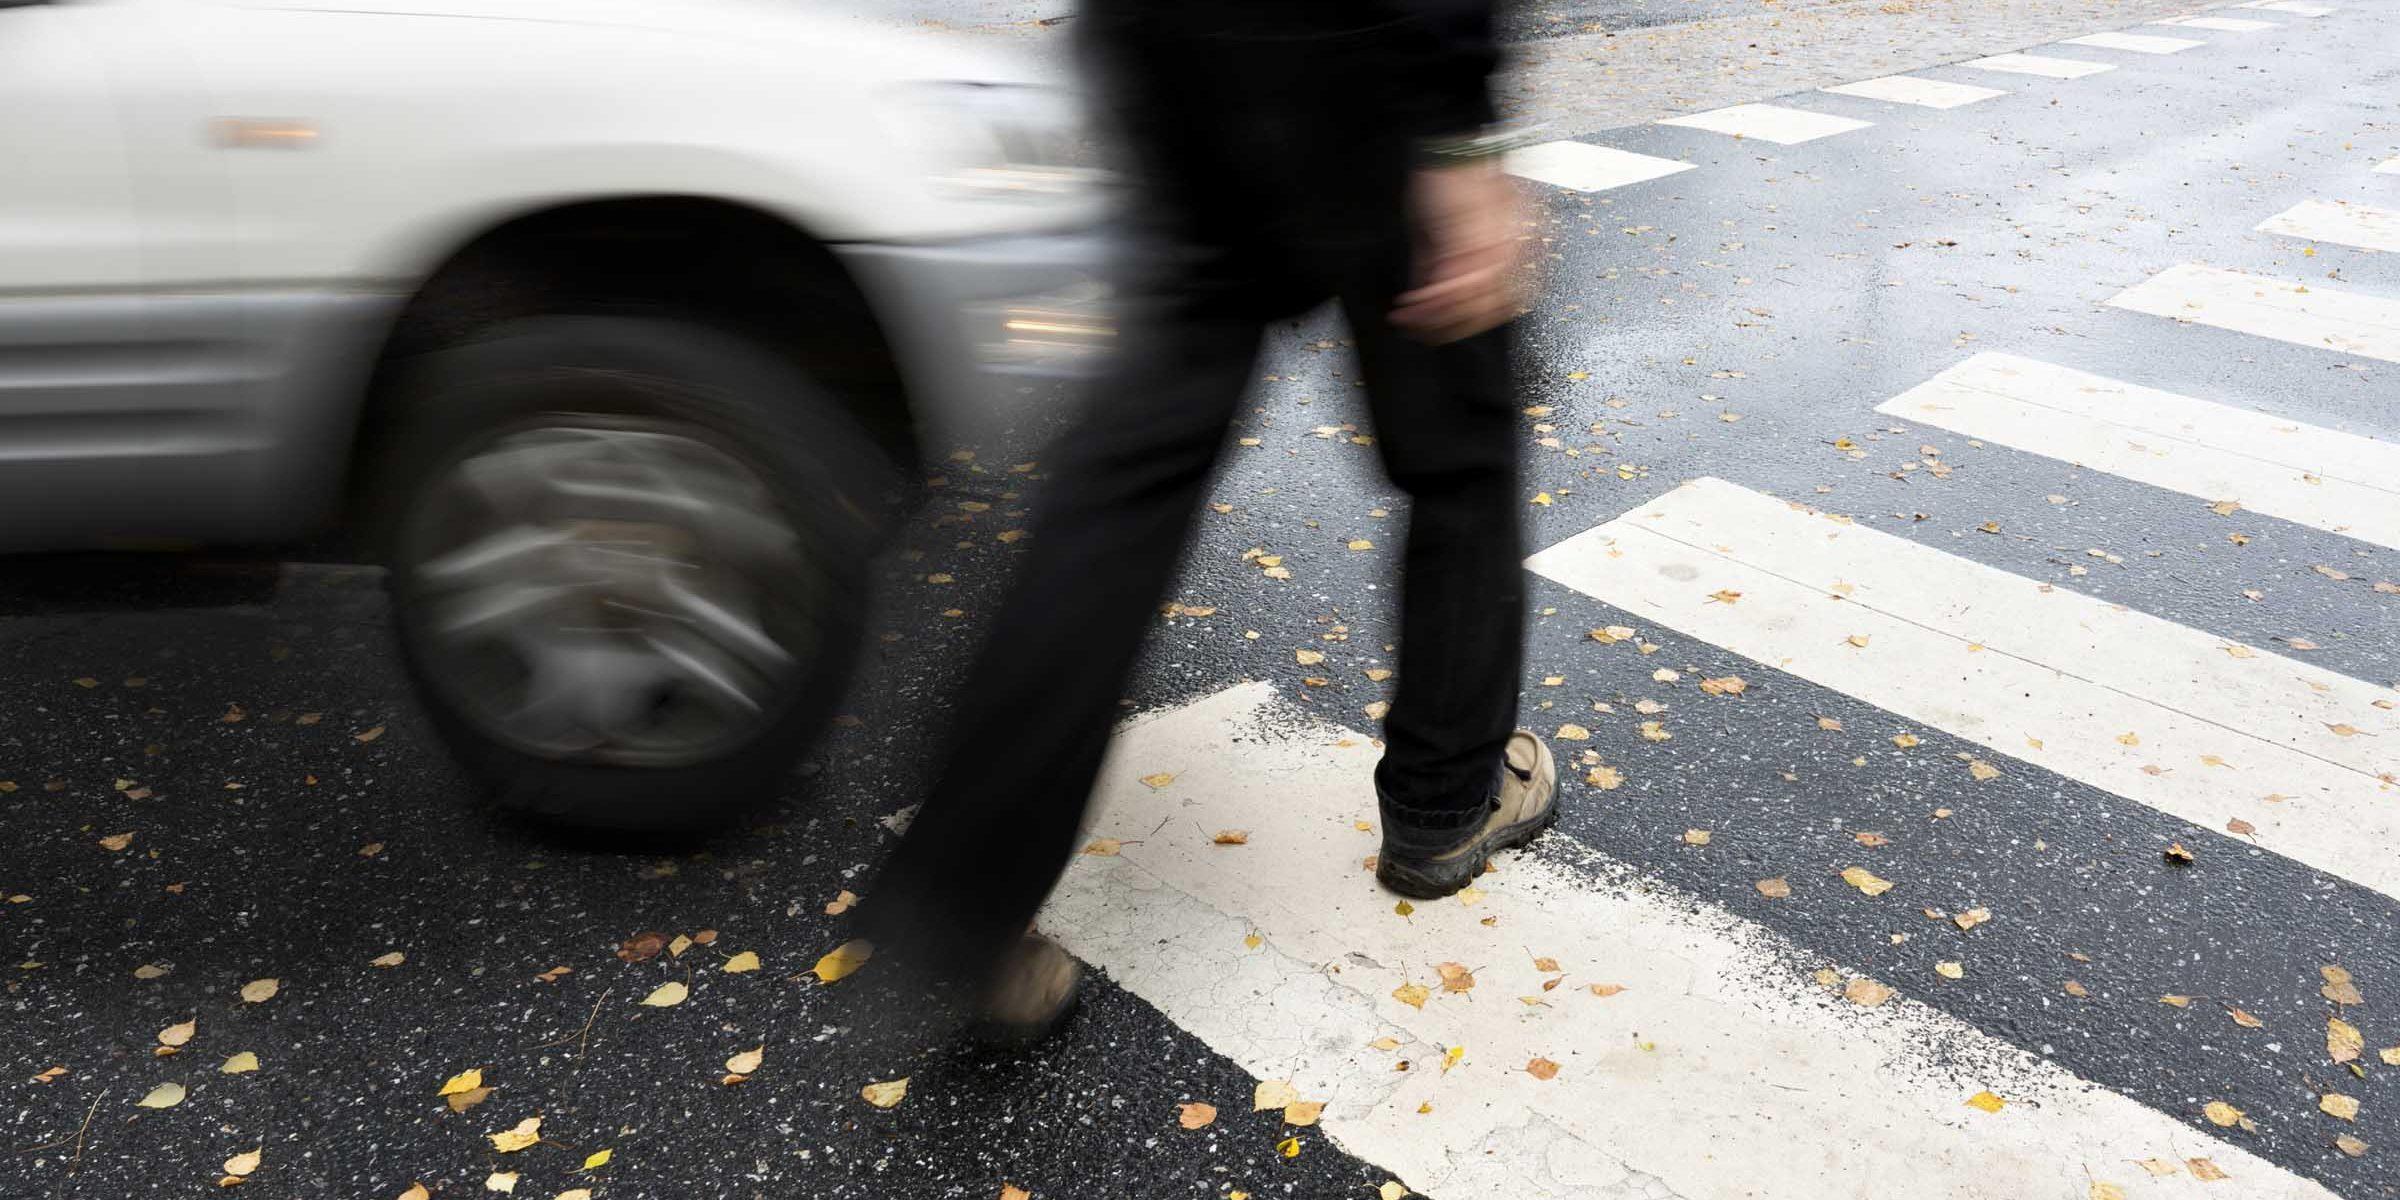 RHE obtains $1.148 million award for pedestrian struck in a hit and run collision